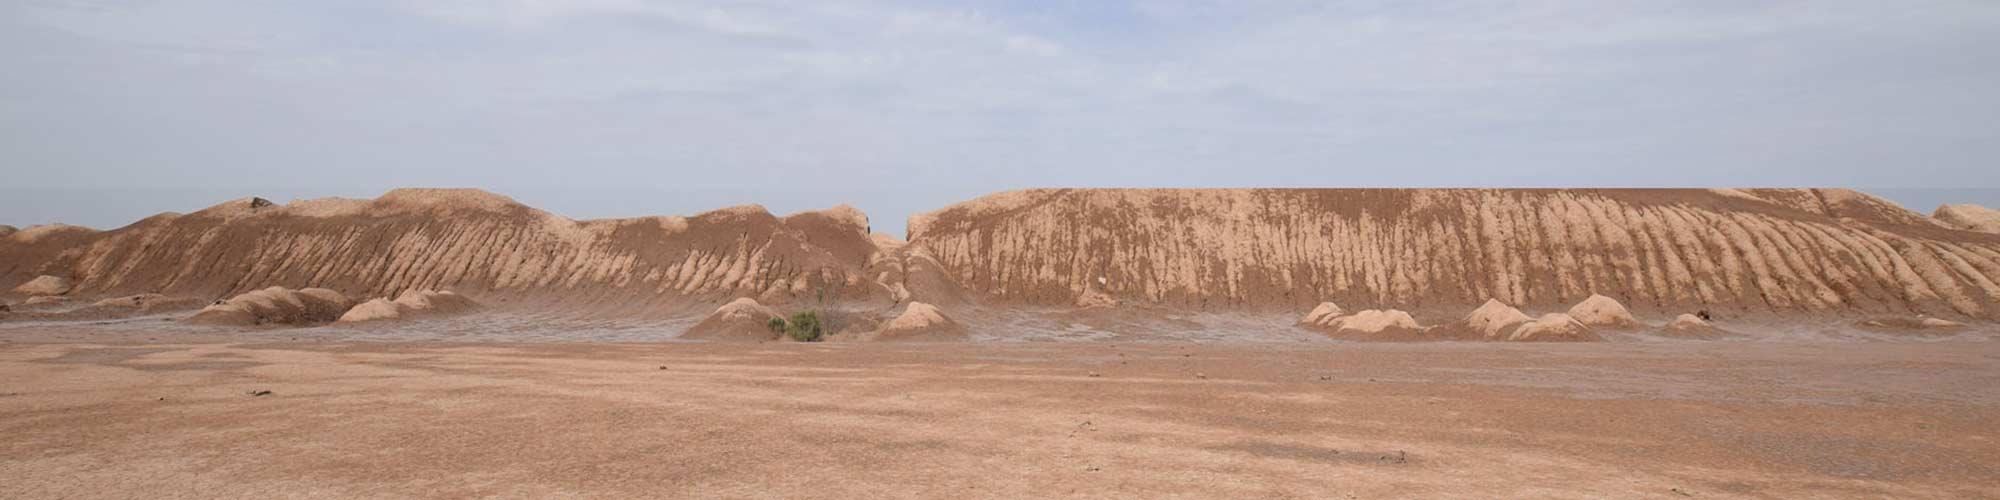 Wall of Charax- El Pais Viajes